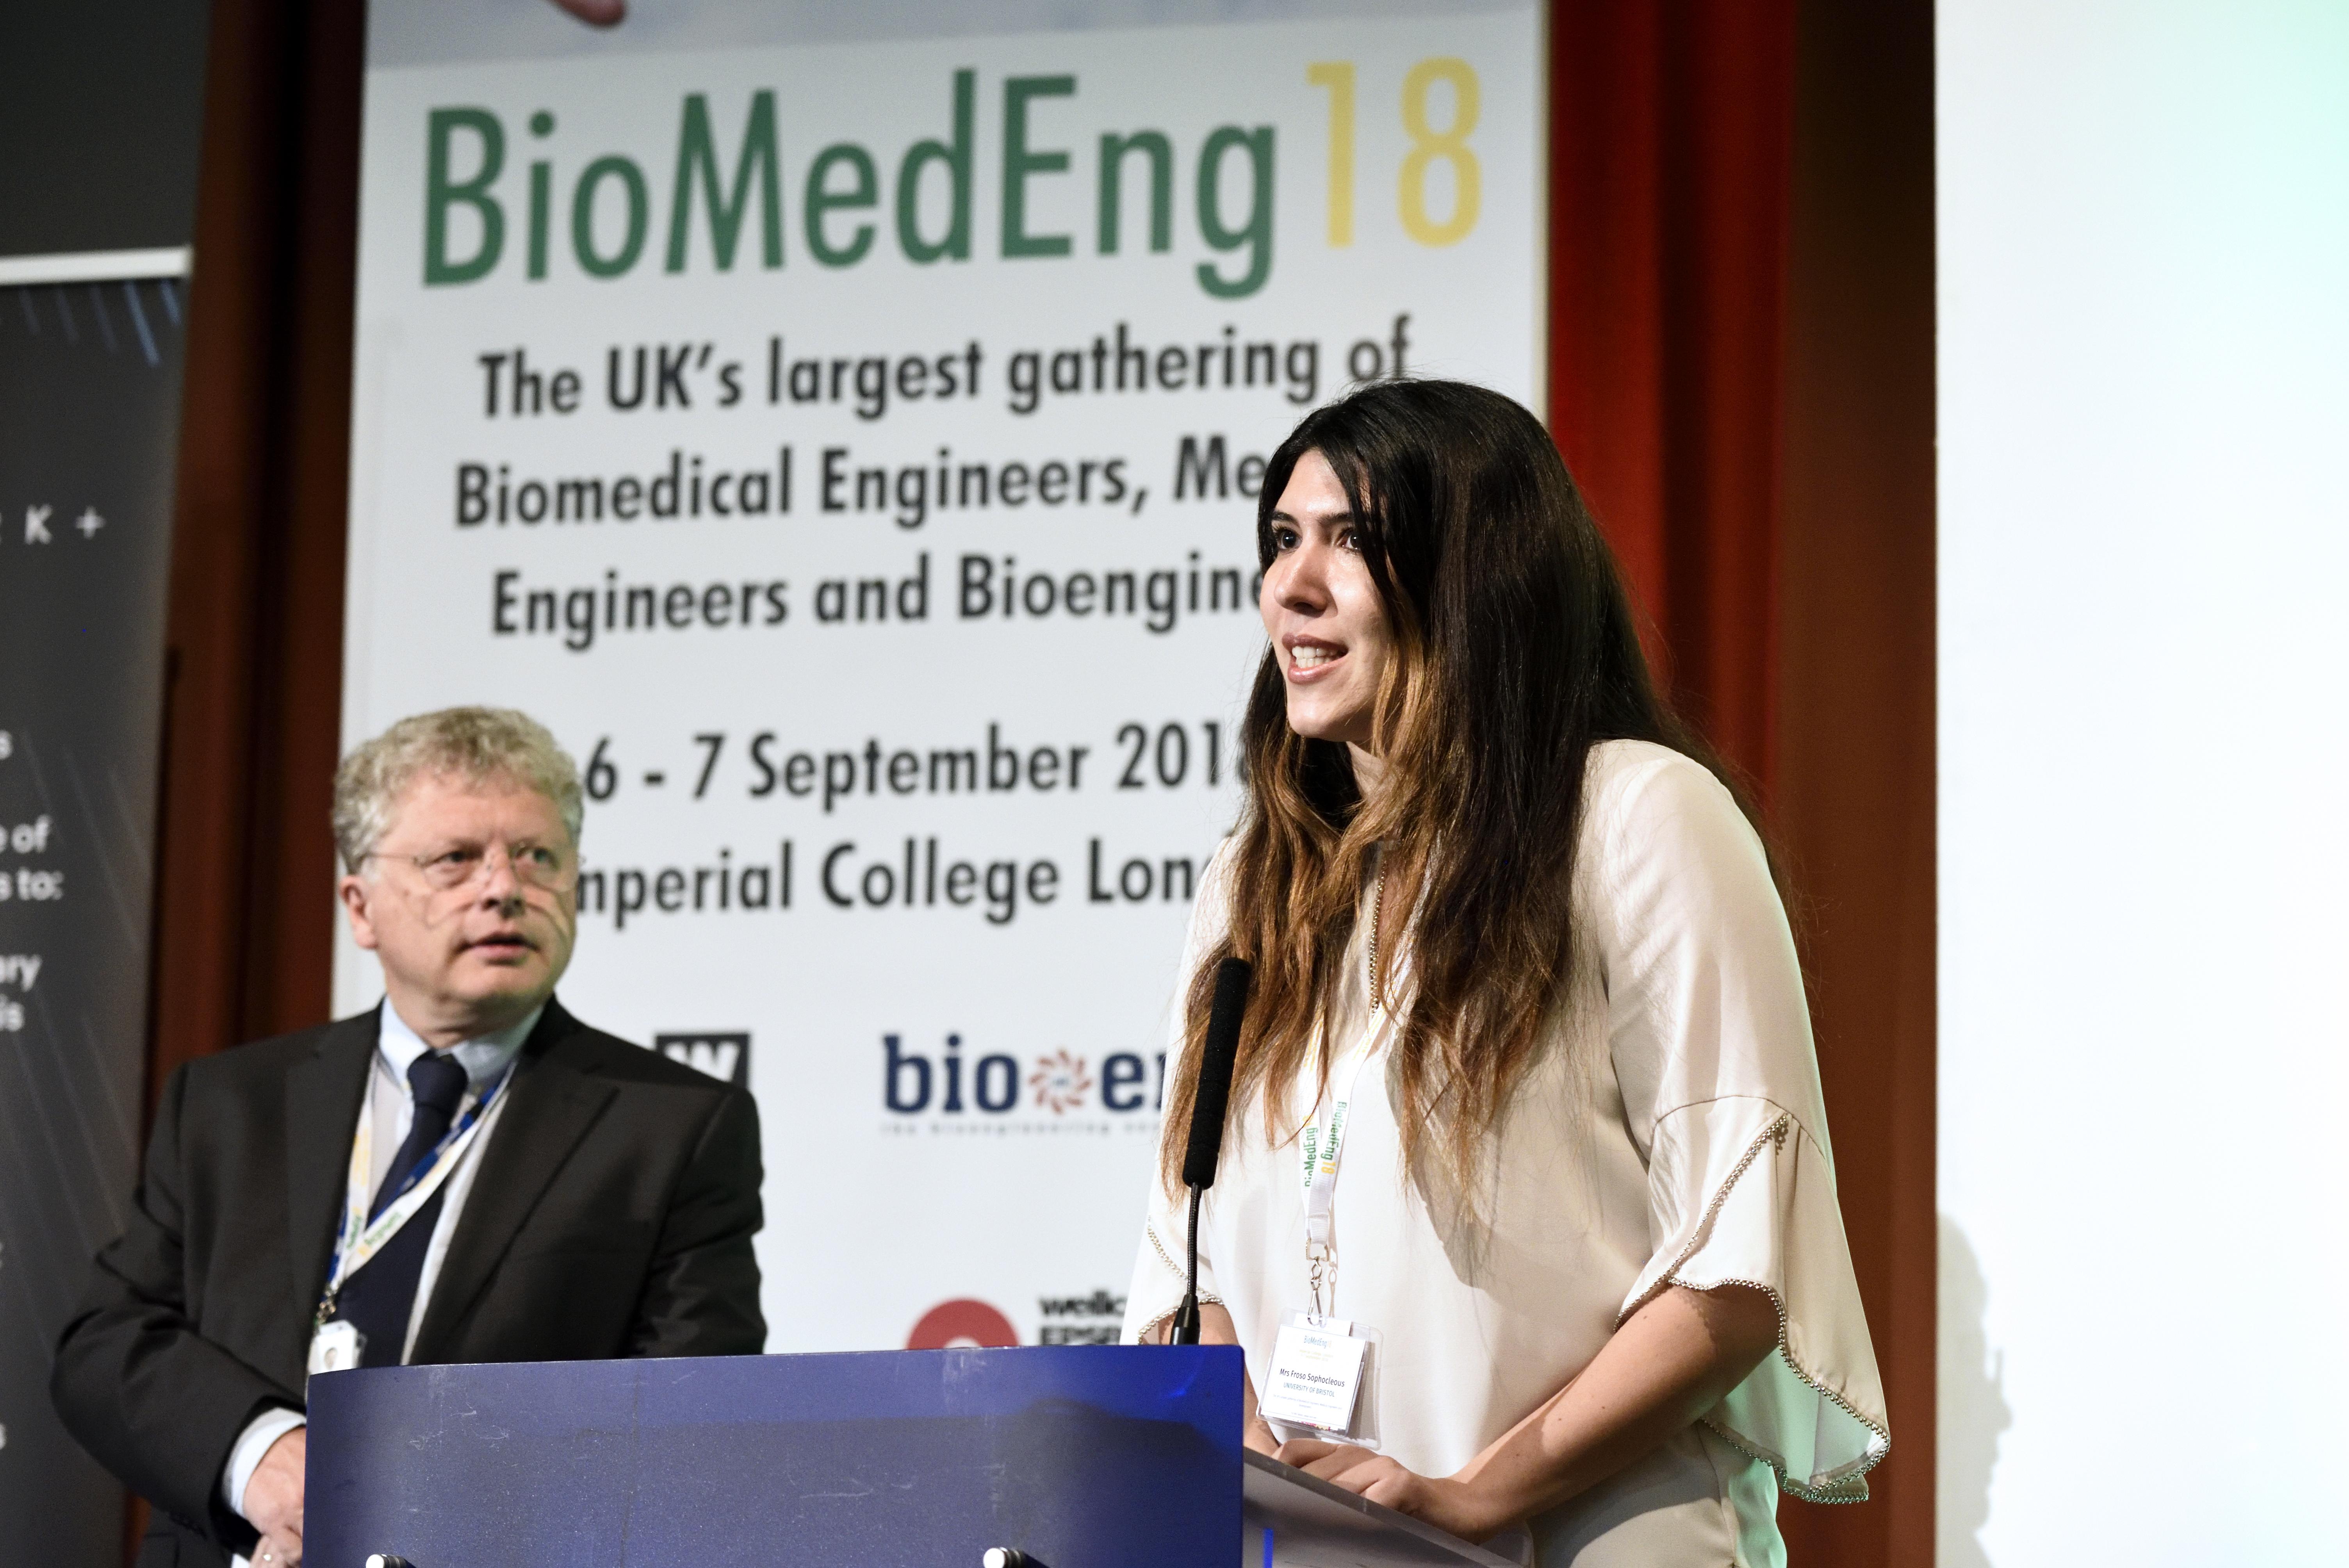 BioMedConf18-036.JPG